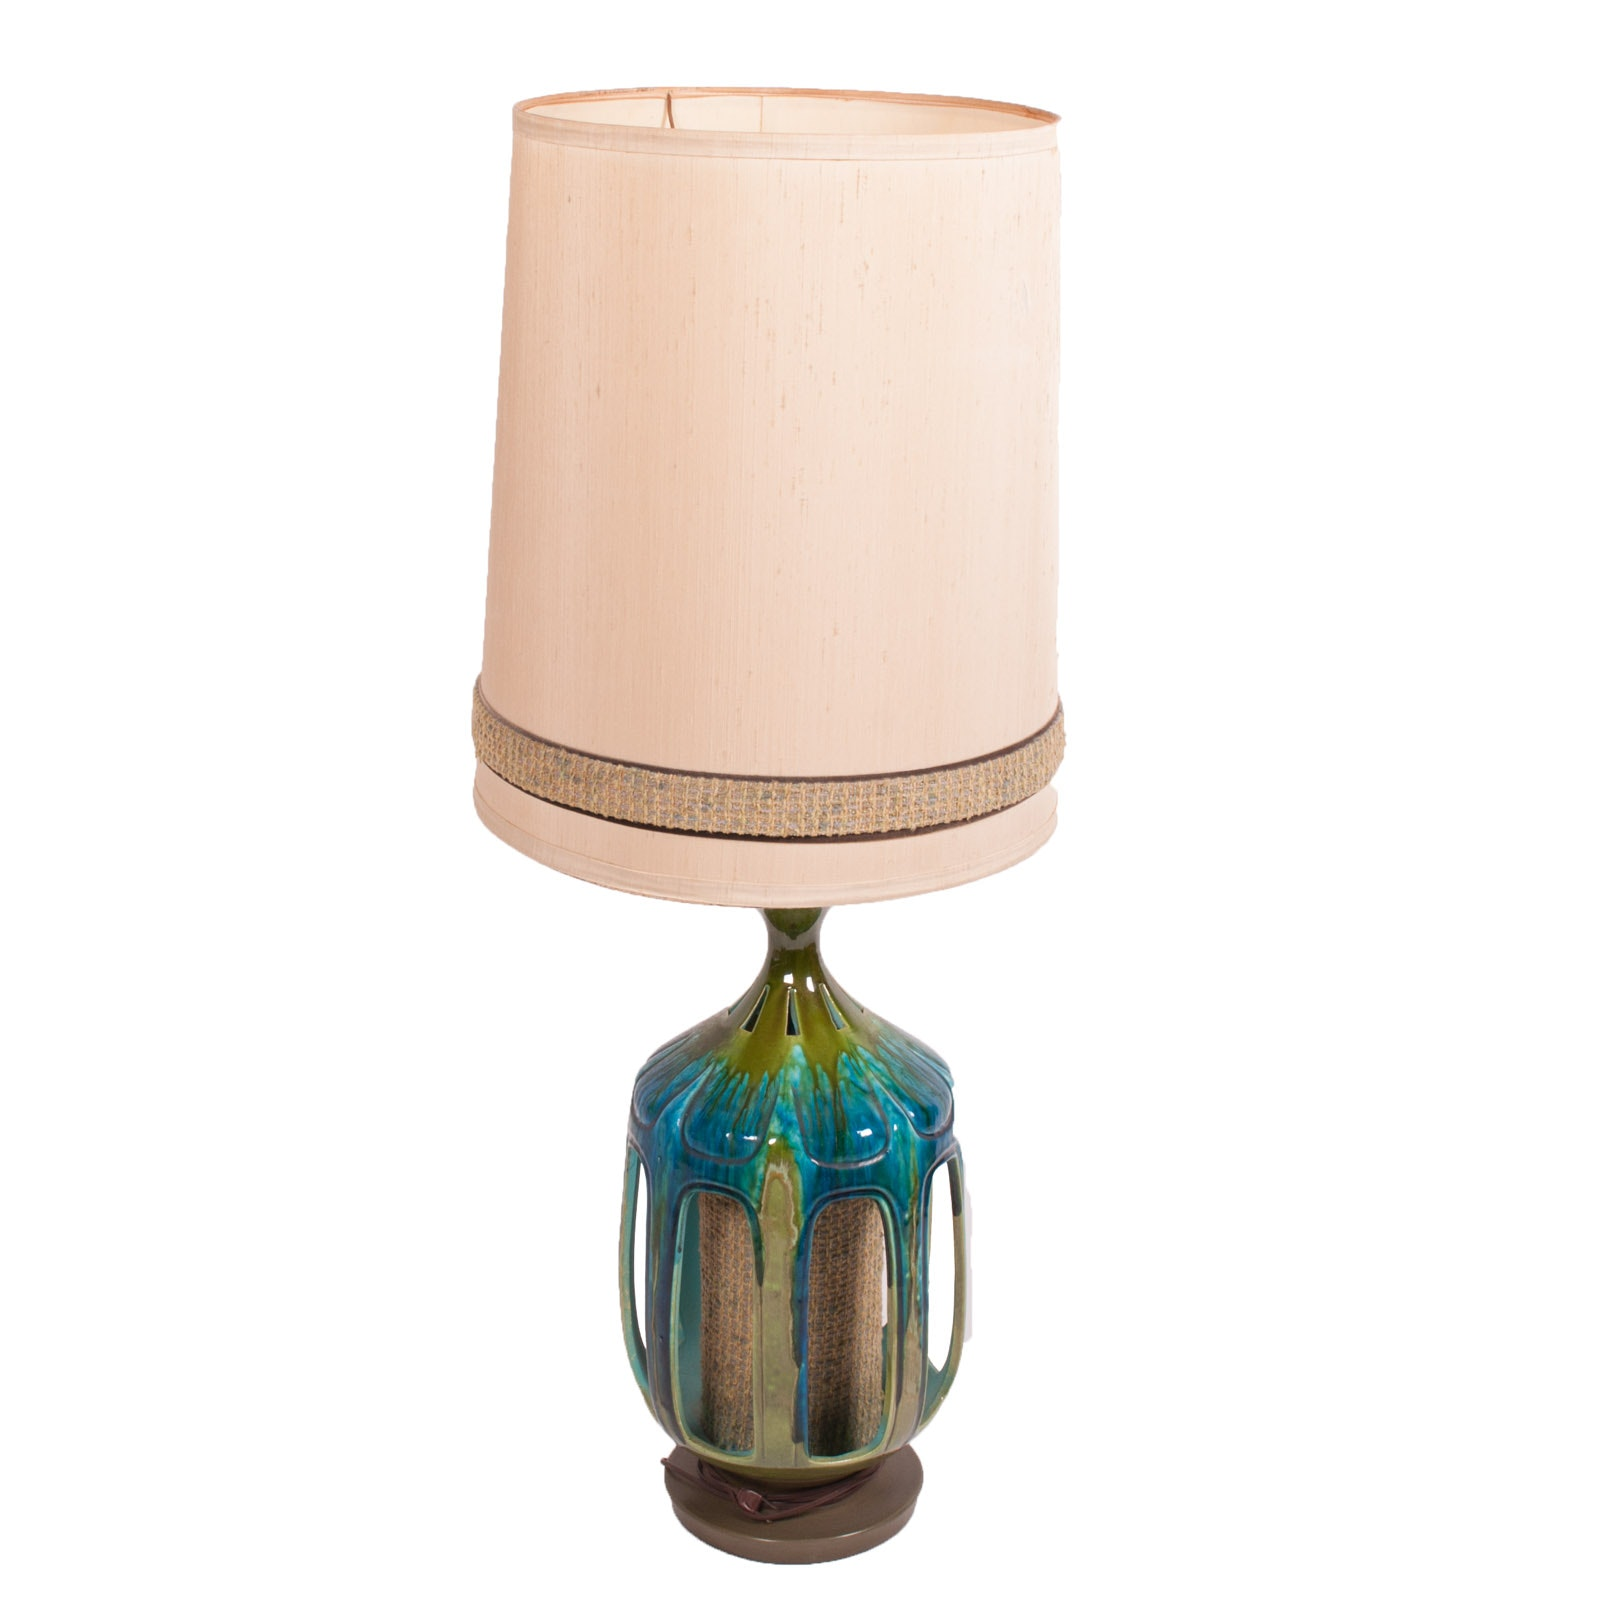 Vintage Mid Century Modern Drip Glaze Ceramic Table Lamp by Honi Chilo